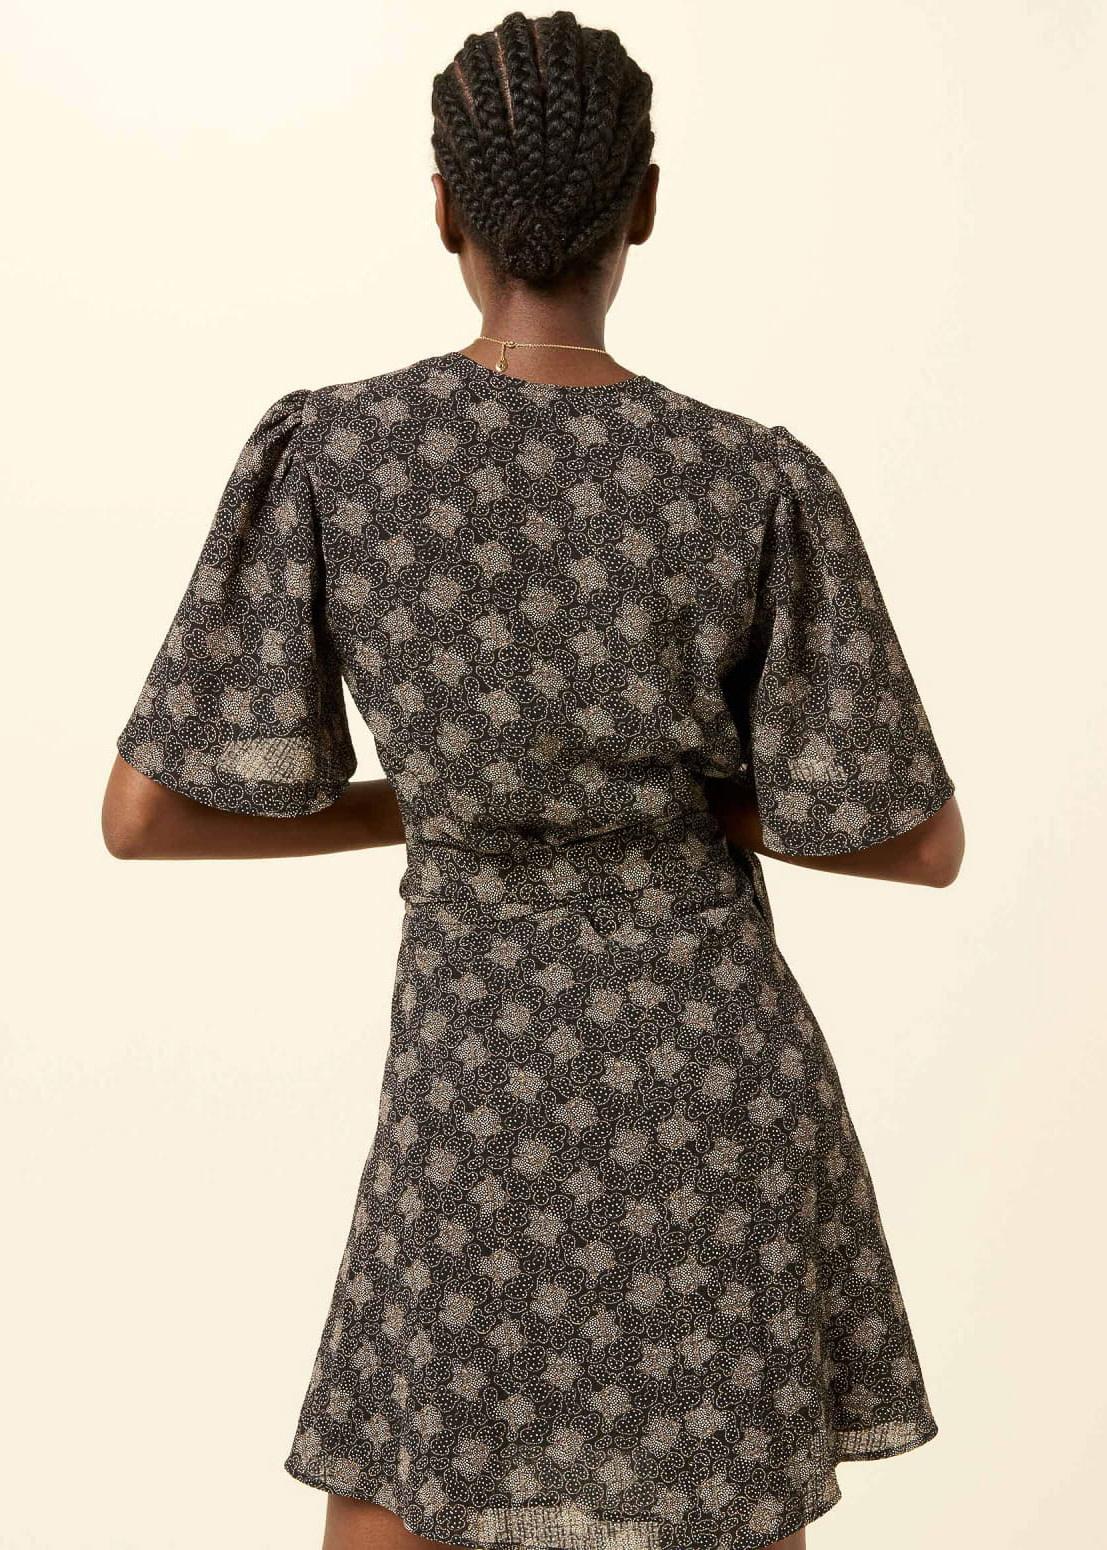 Sessùn Mio swinger dress